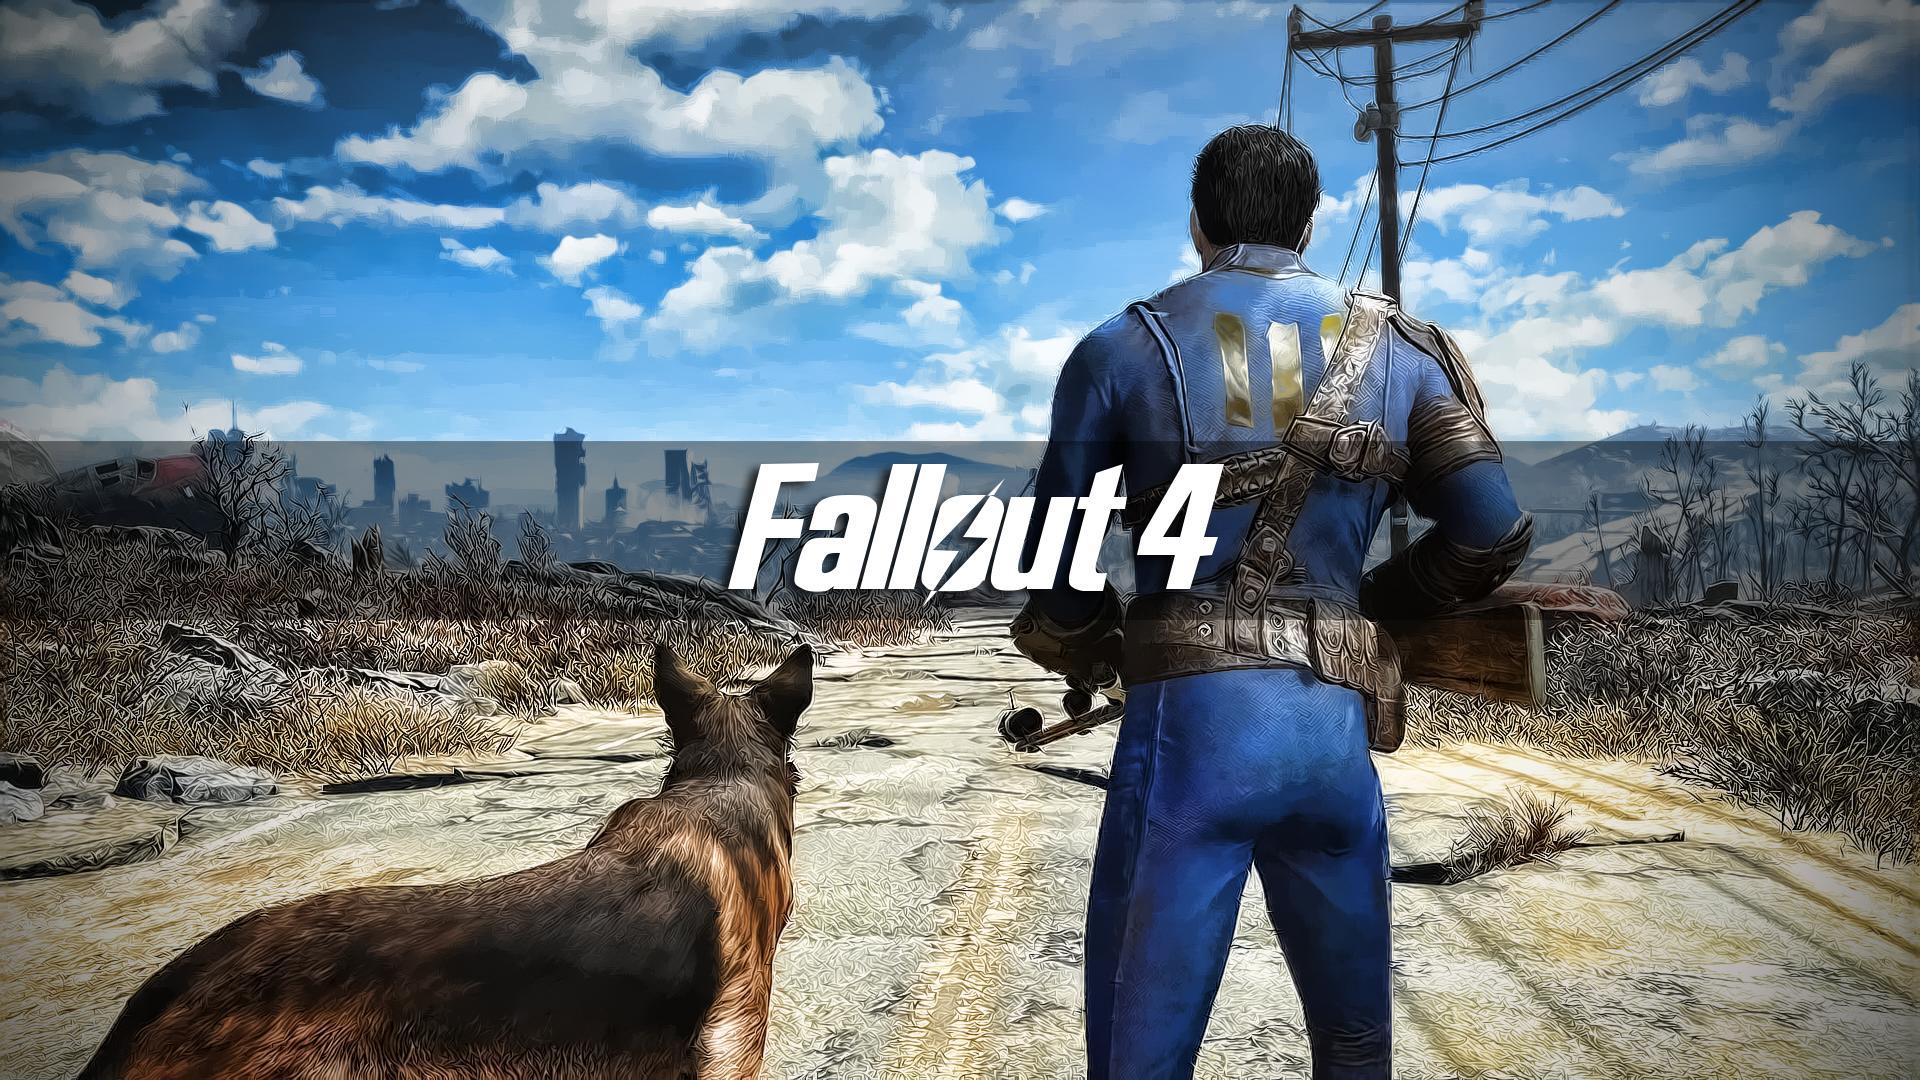 Fallout 4 1920x1080